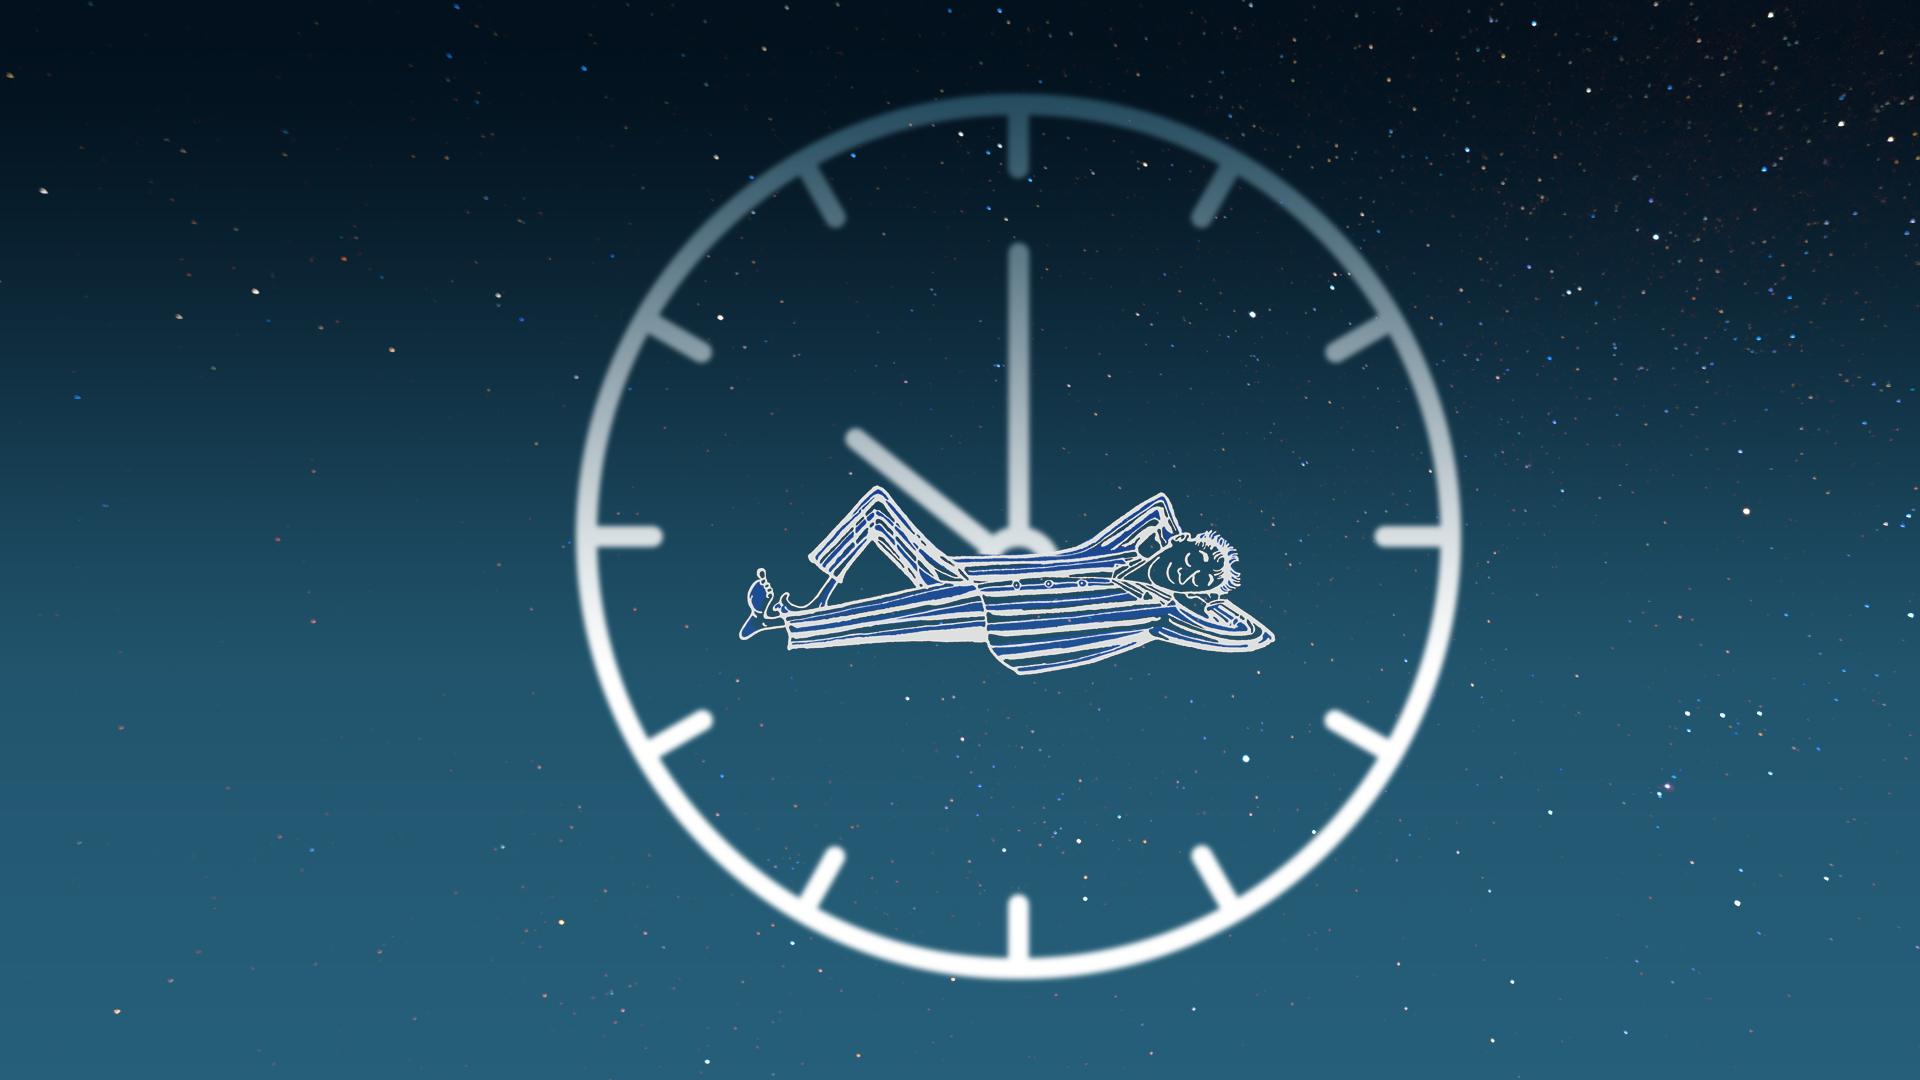 How to get a good night's sleep